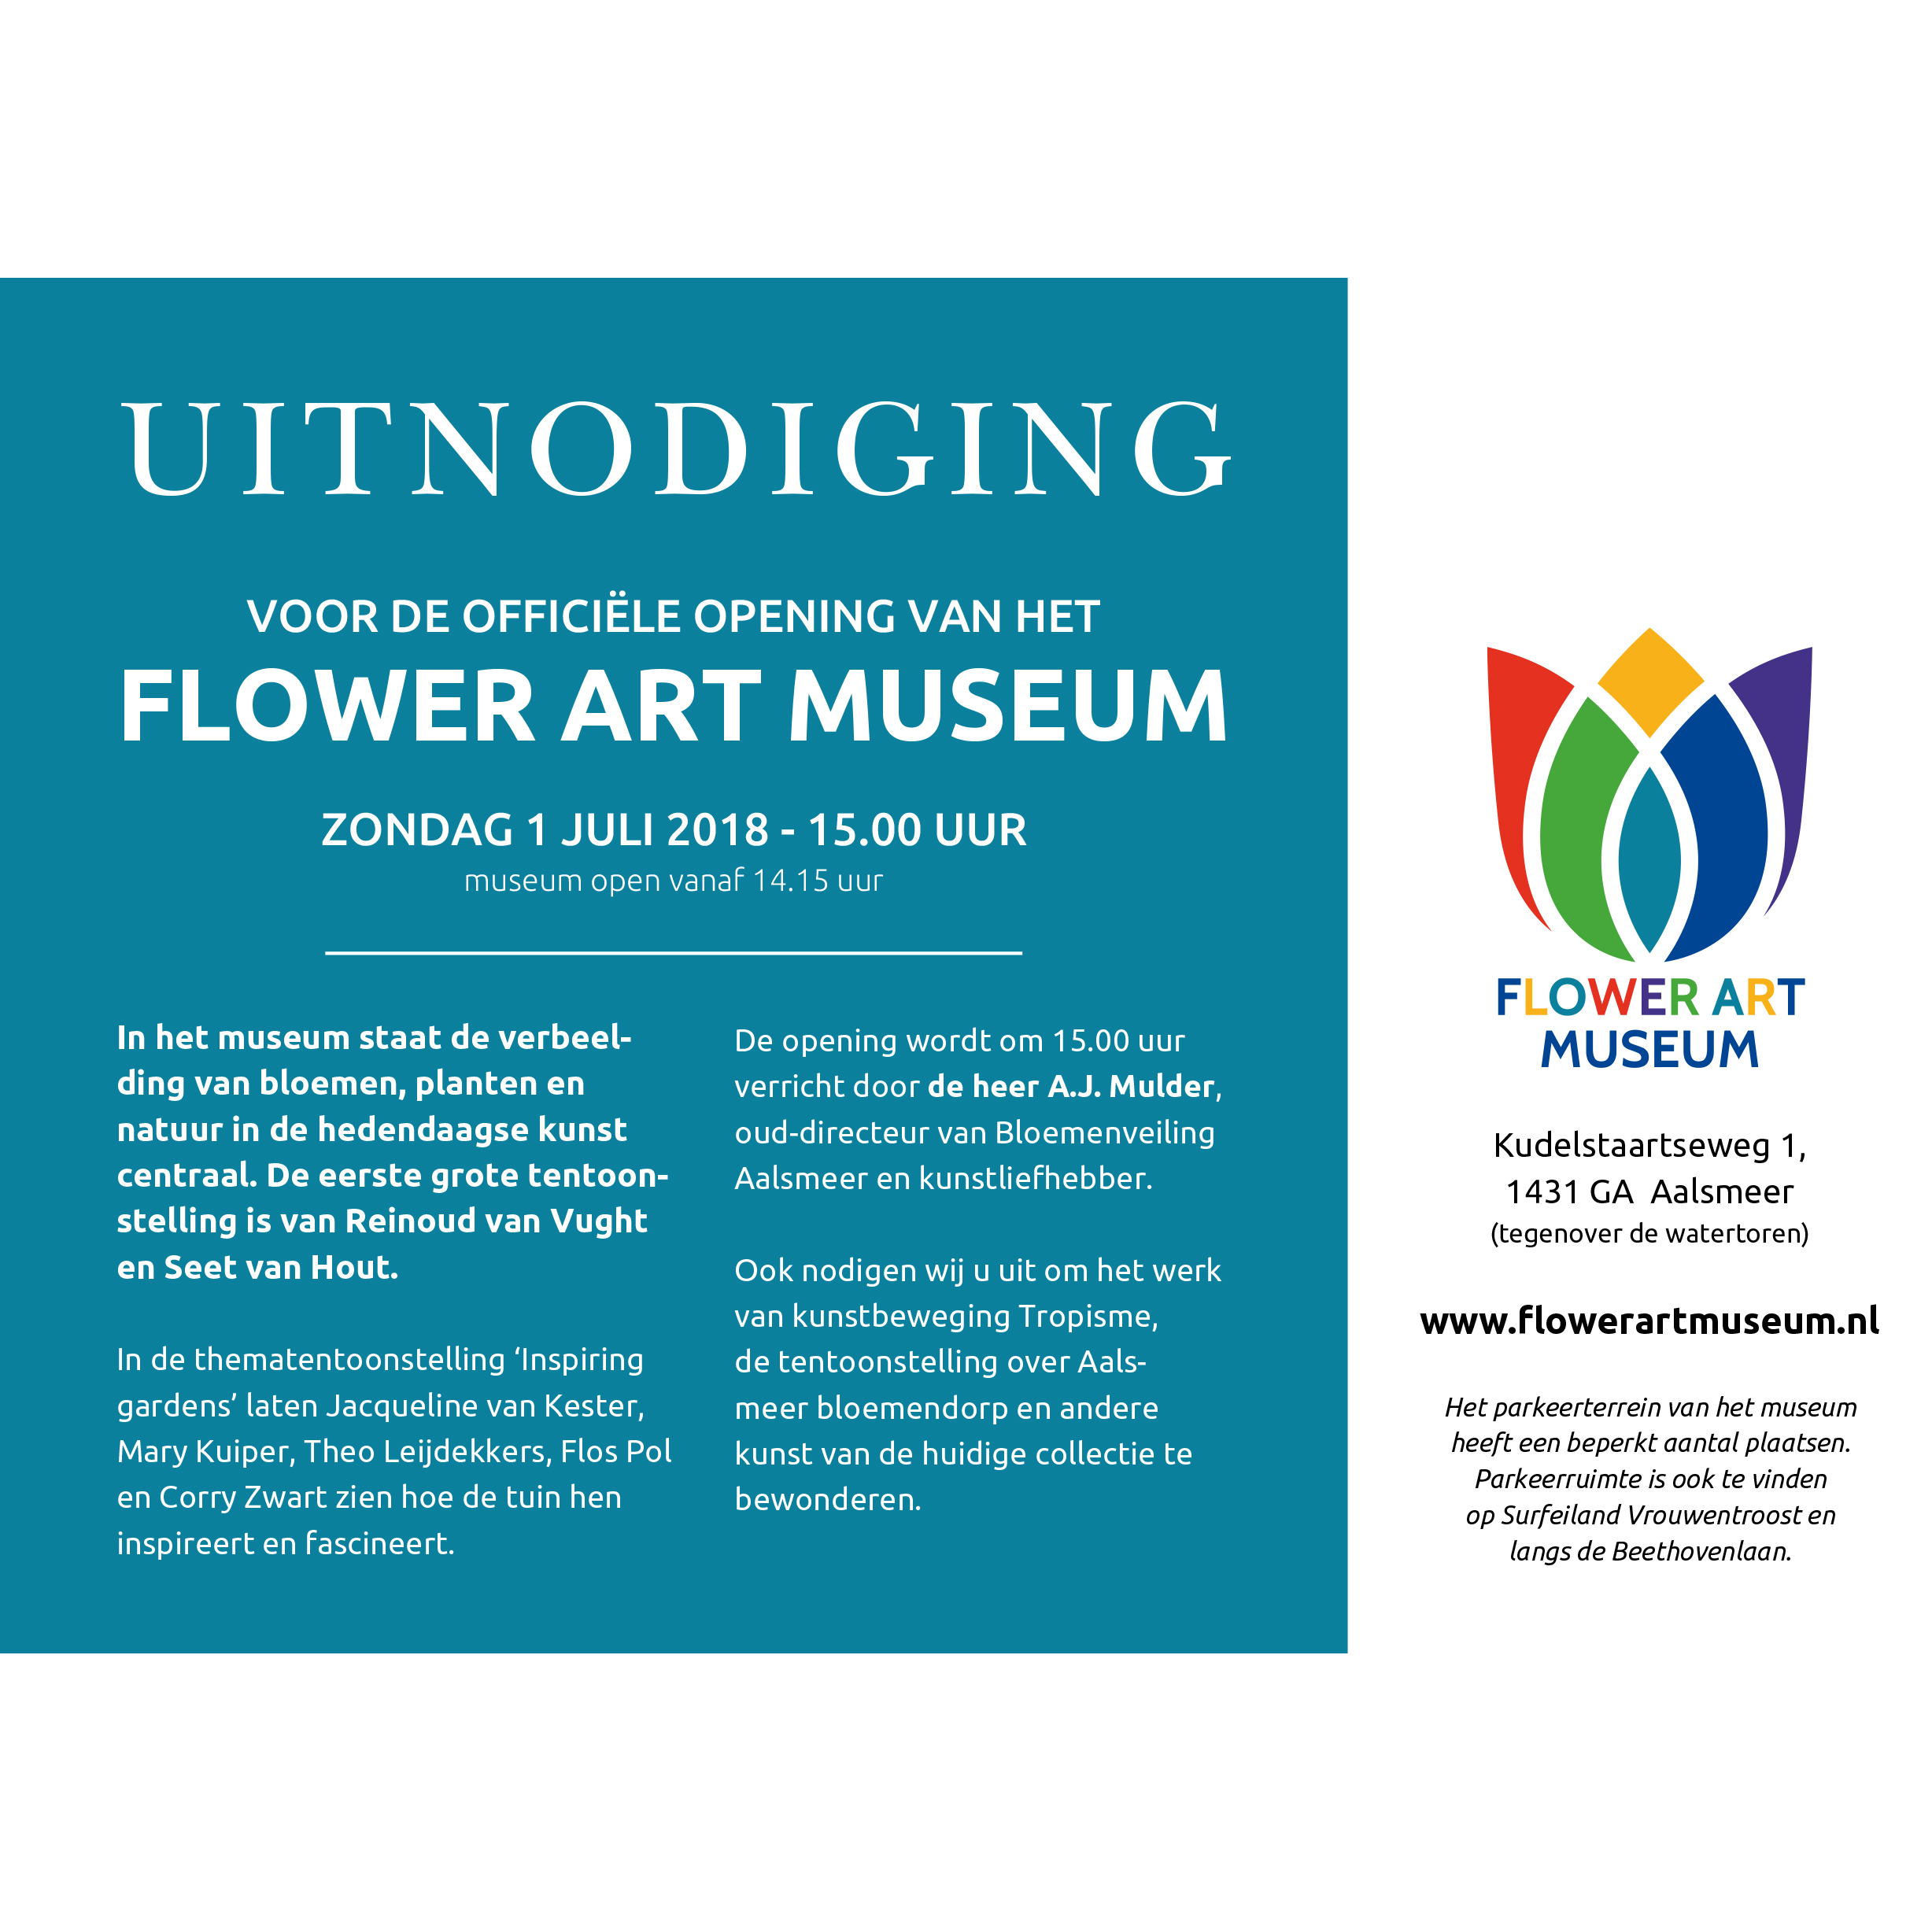 Uitnodiging opening Flower Art Museum.jpg